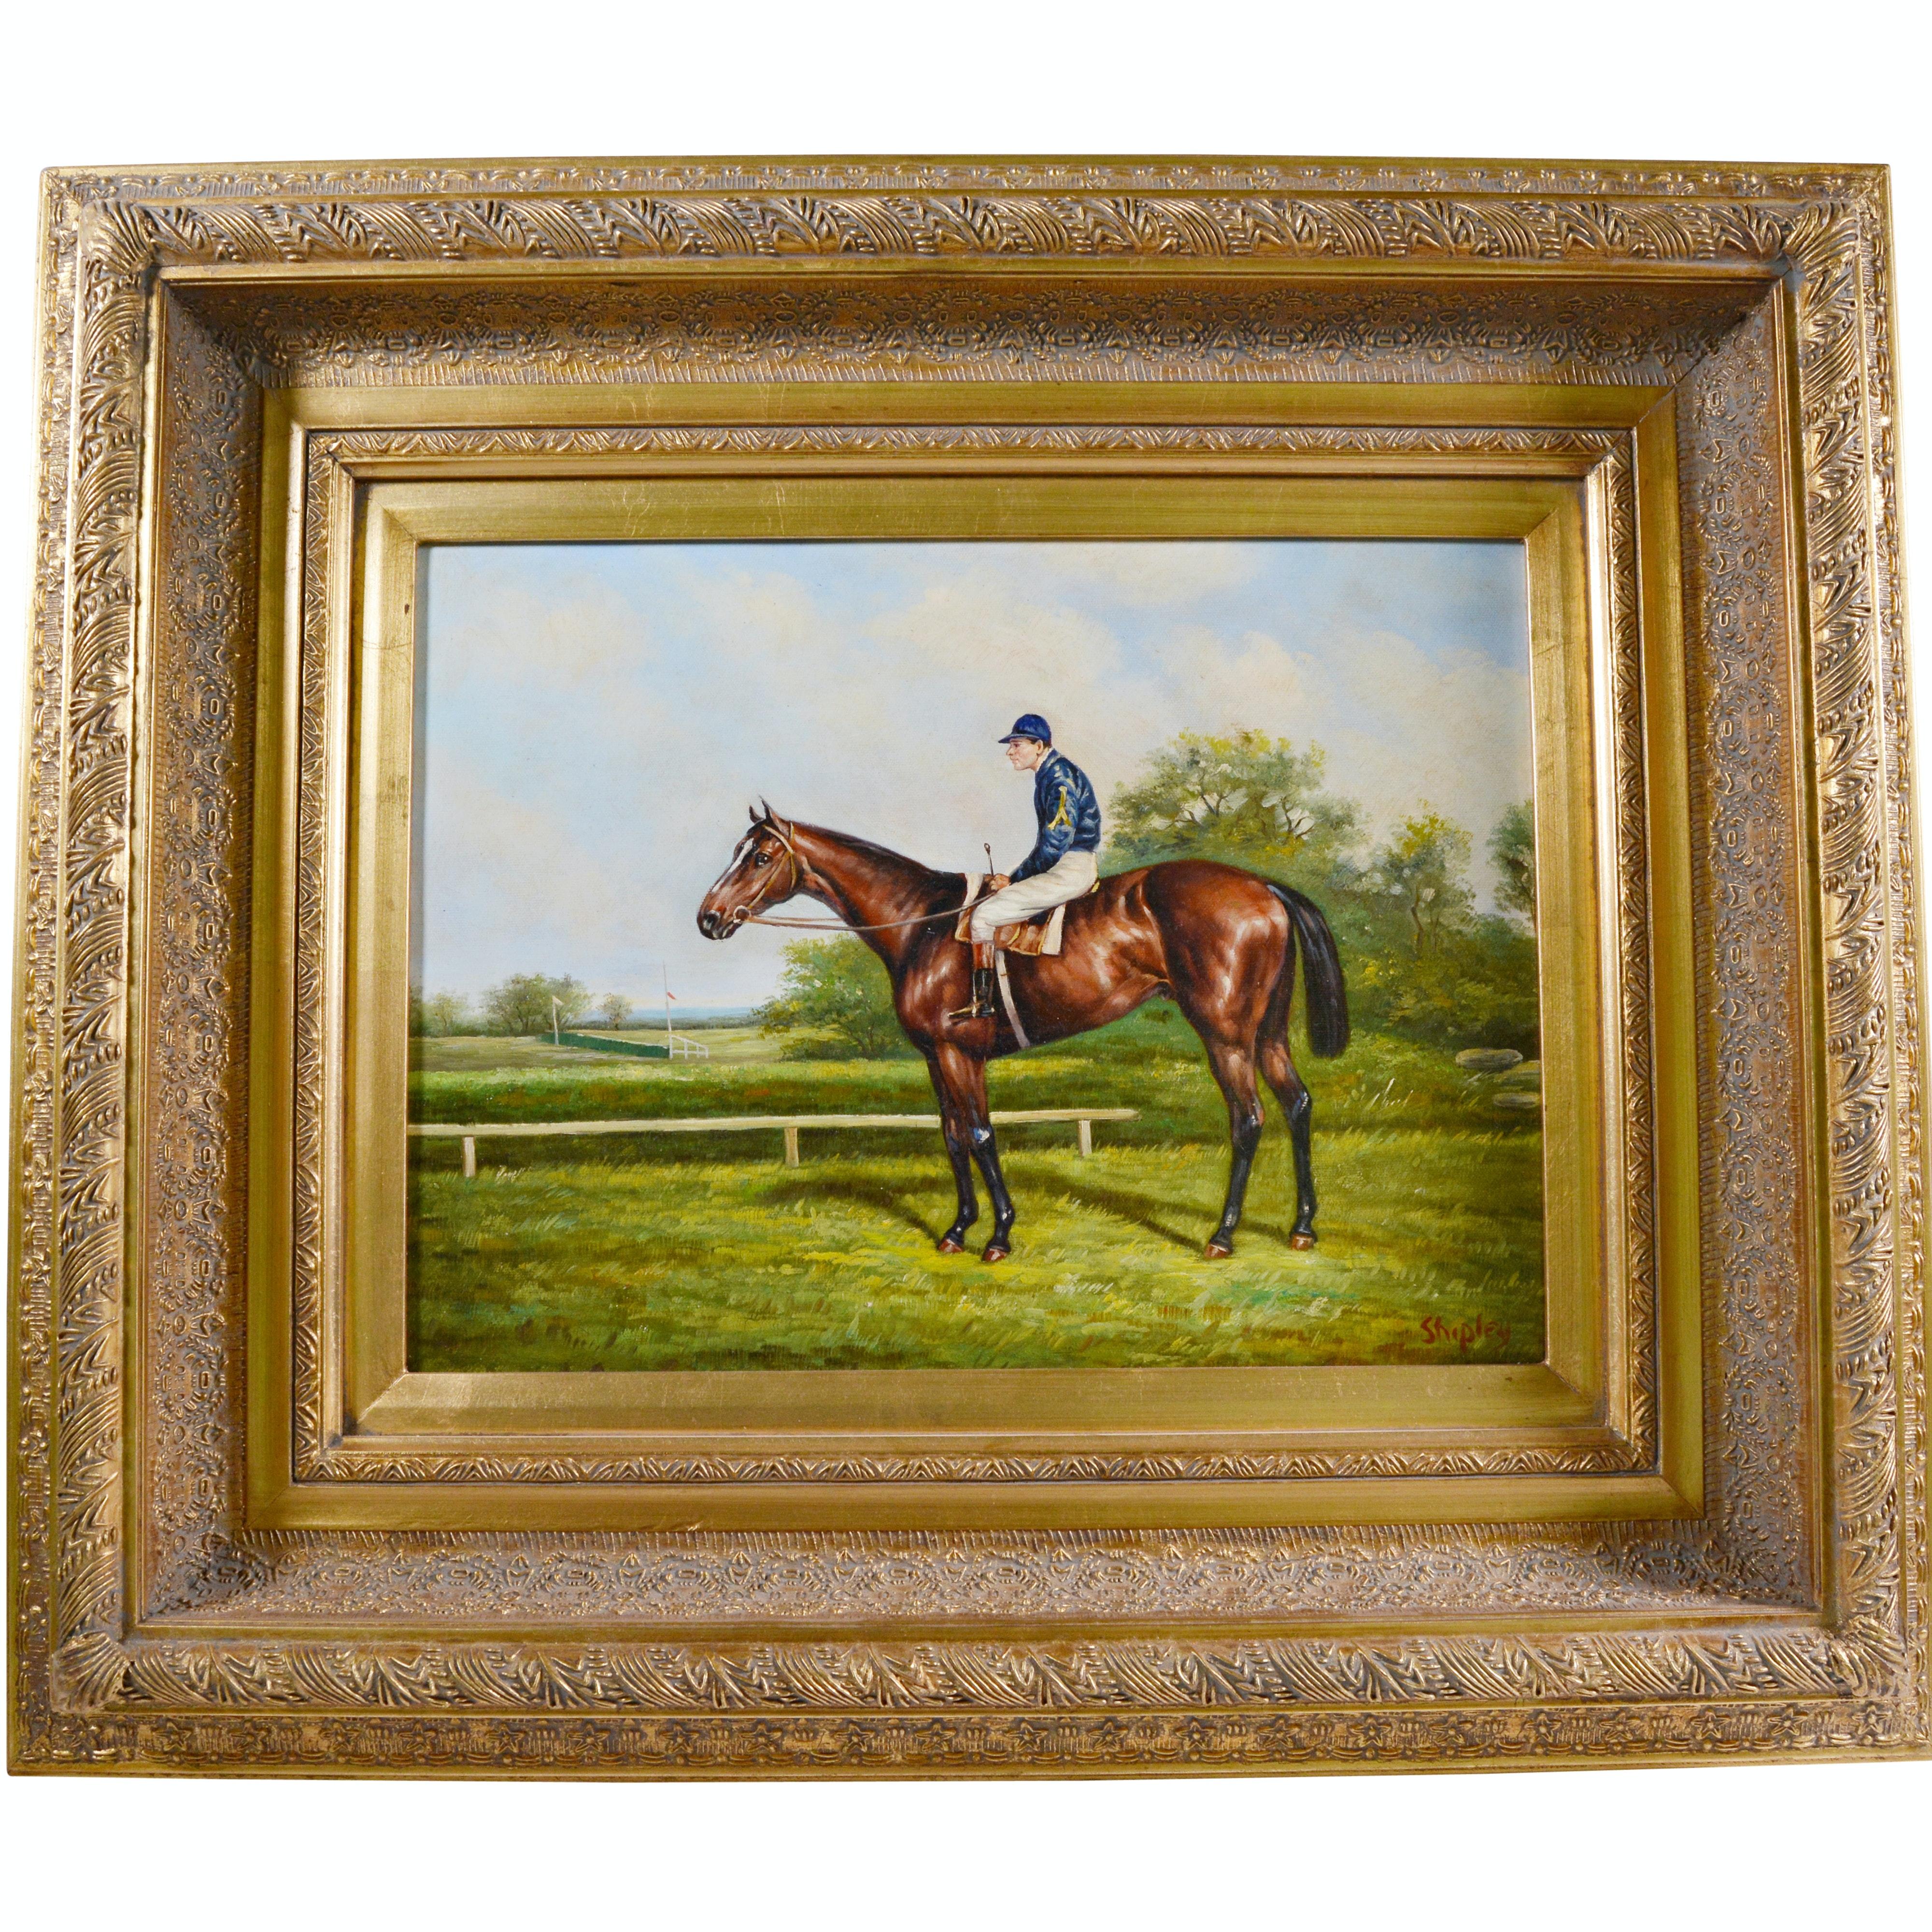 Shipley Oil Painting of Horse and Jockey